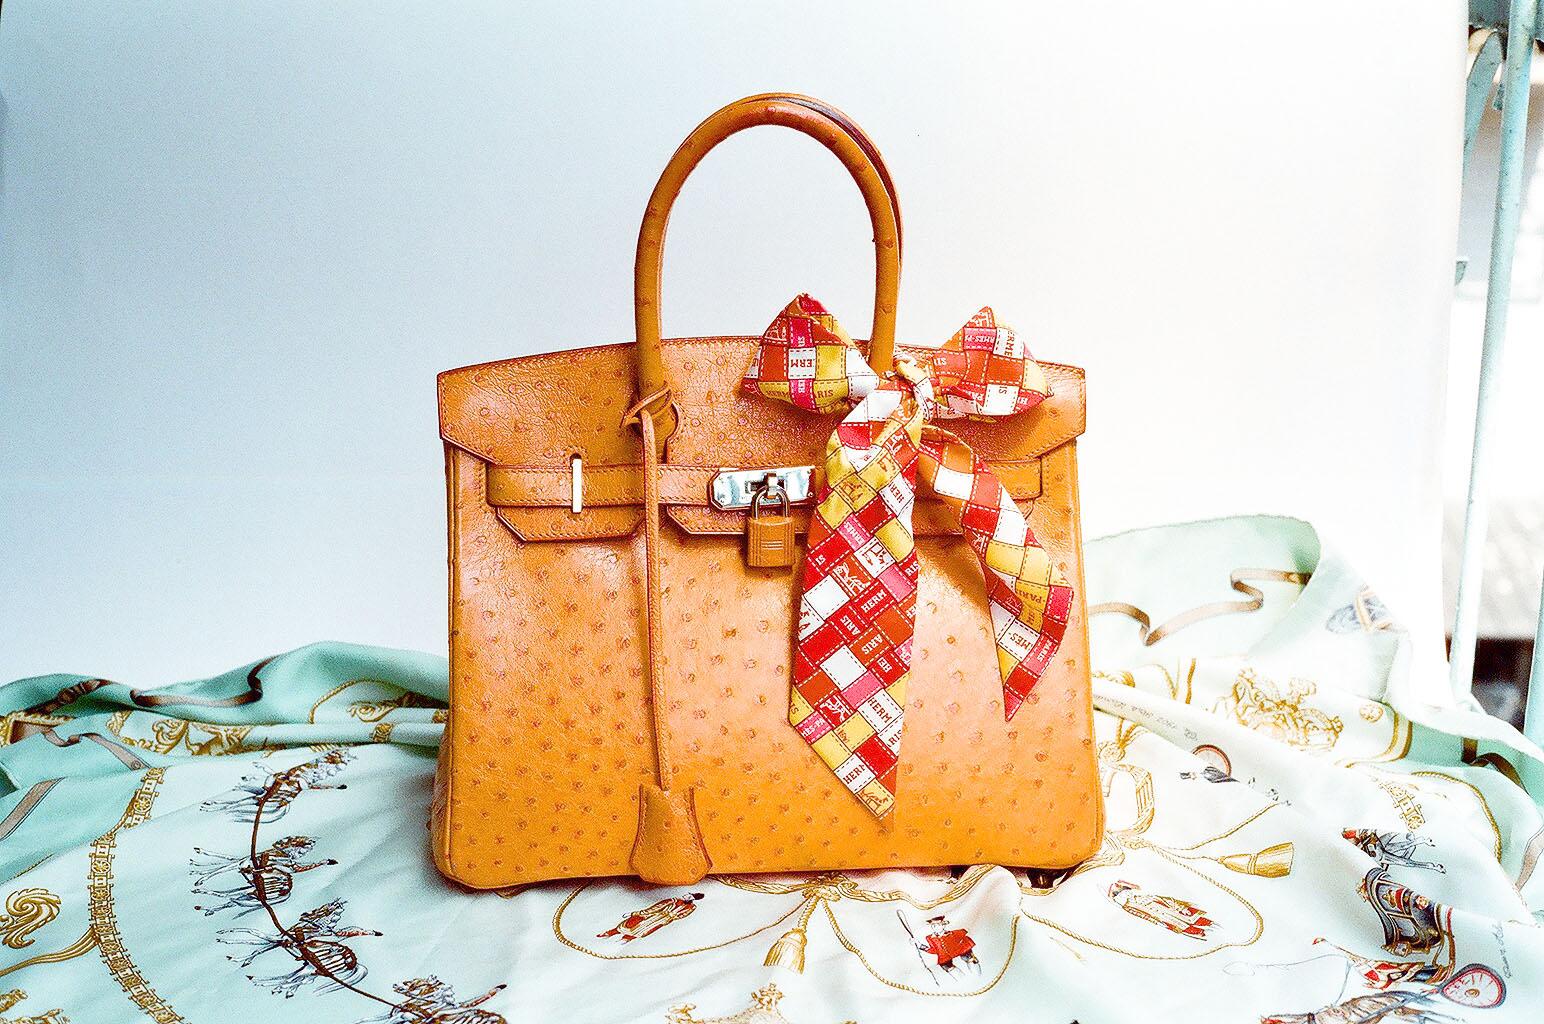 Hermes-Ostrich-Birkin-Bag